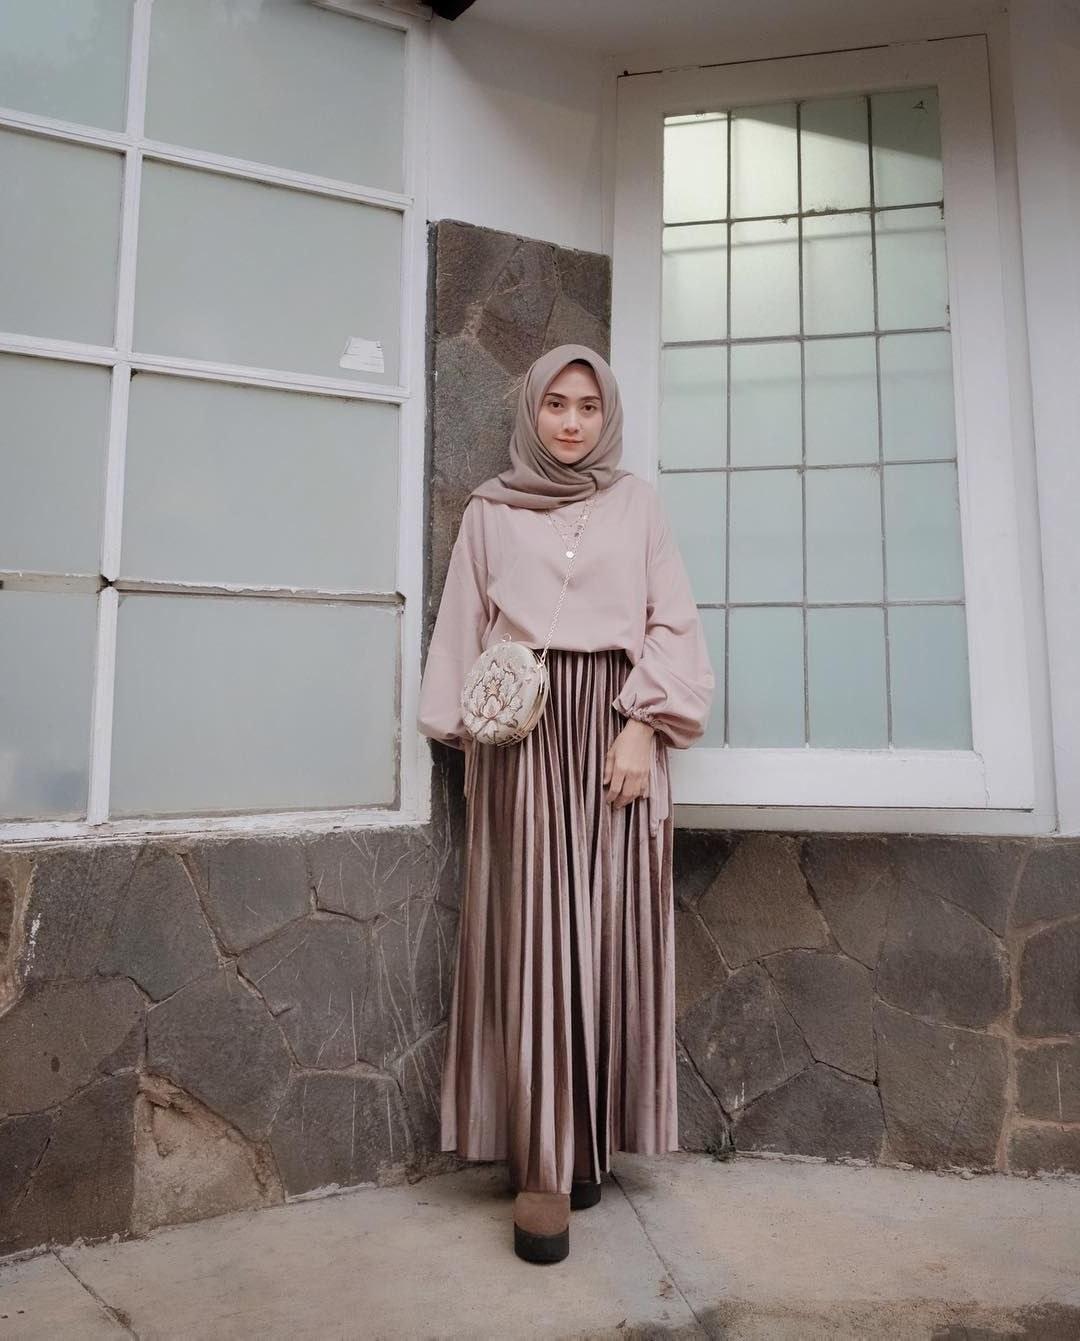 Inspirasi Baju Lebaran 2020 Remaja Wanita Jxdu Baju Lebaran 2020 Untuk Remaja Mainmata Studio